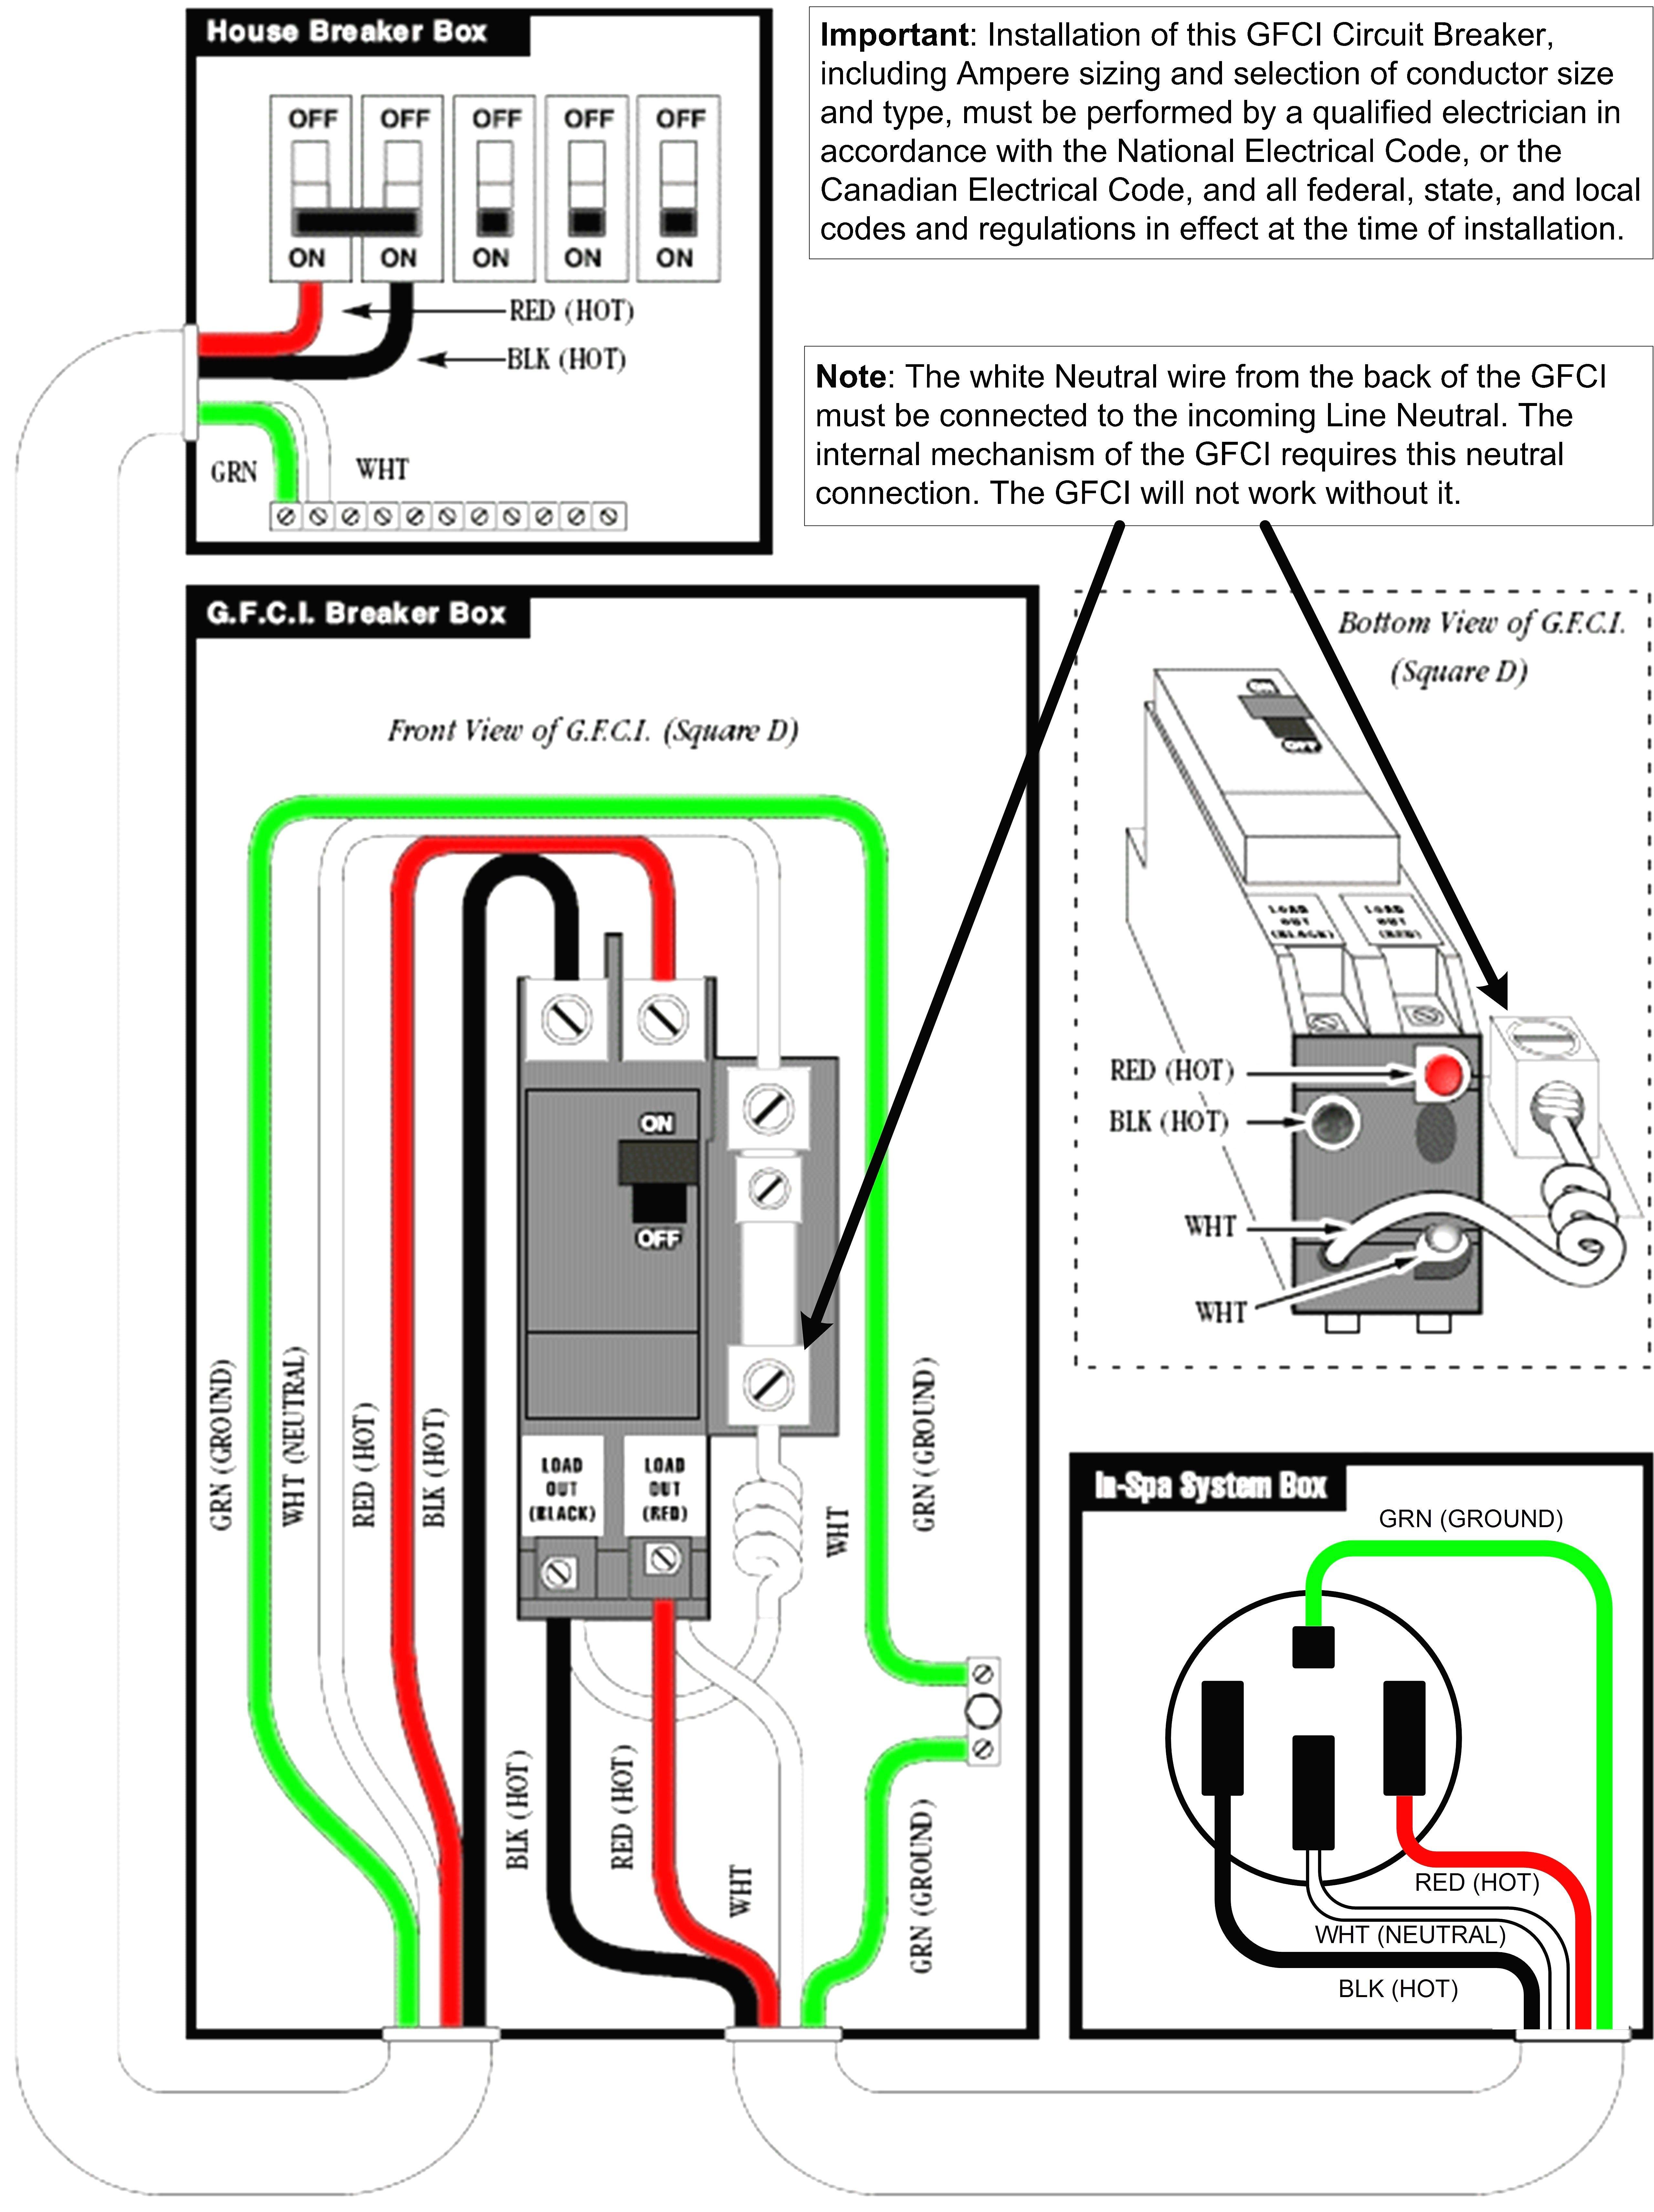 new gfci wiring diagram for hot tub diagram diagramsample diagramtemplate wiringdiagram  [ 5119 x 6844 Pixel ]